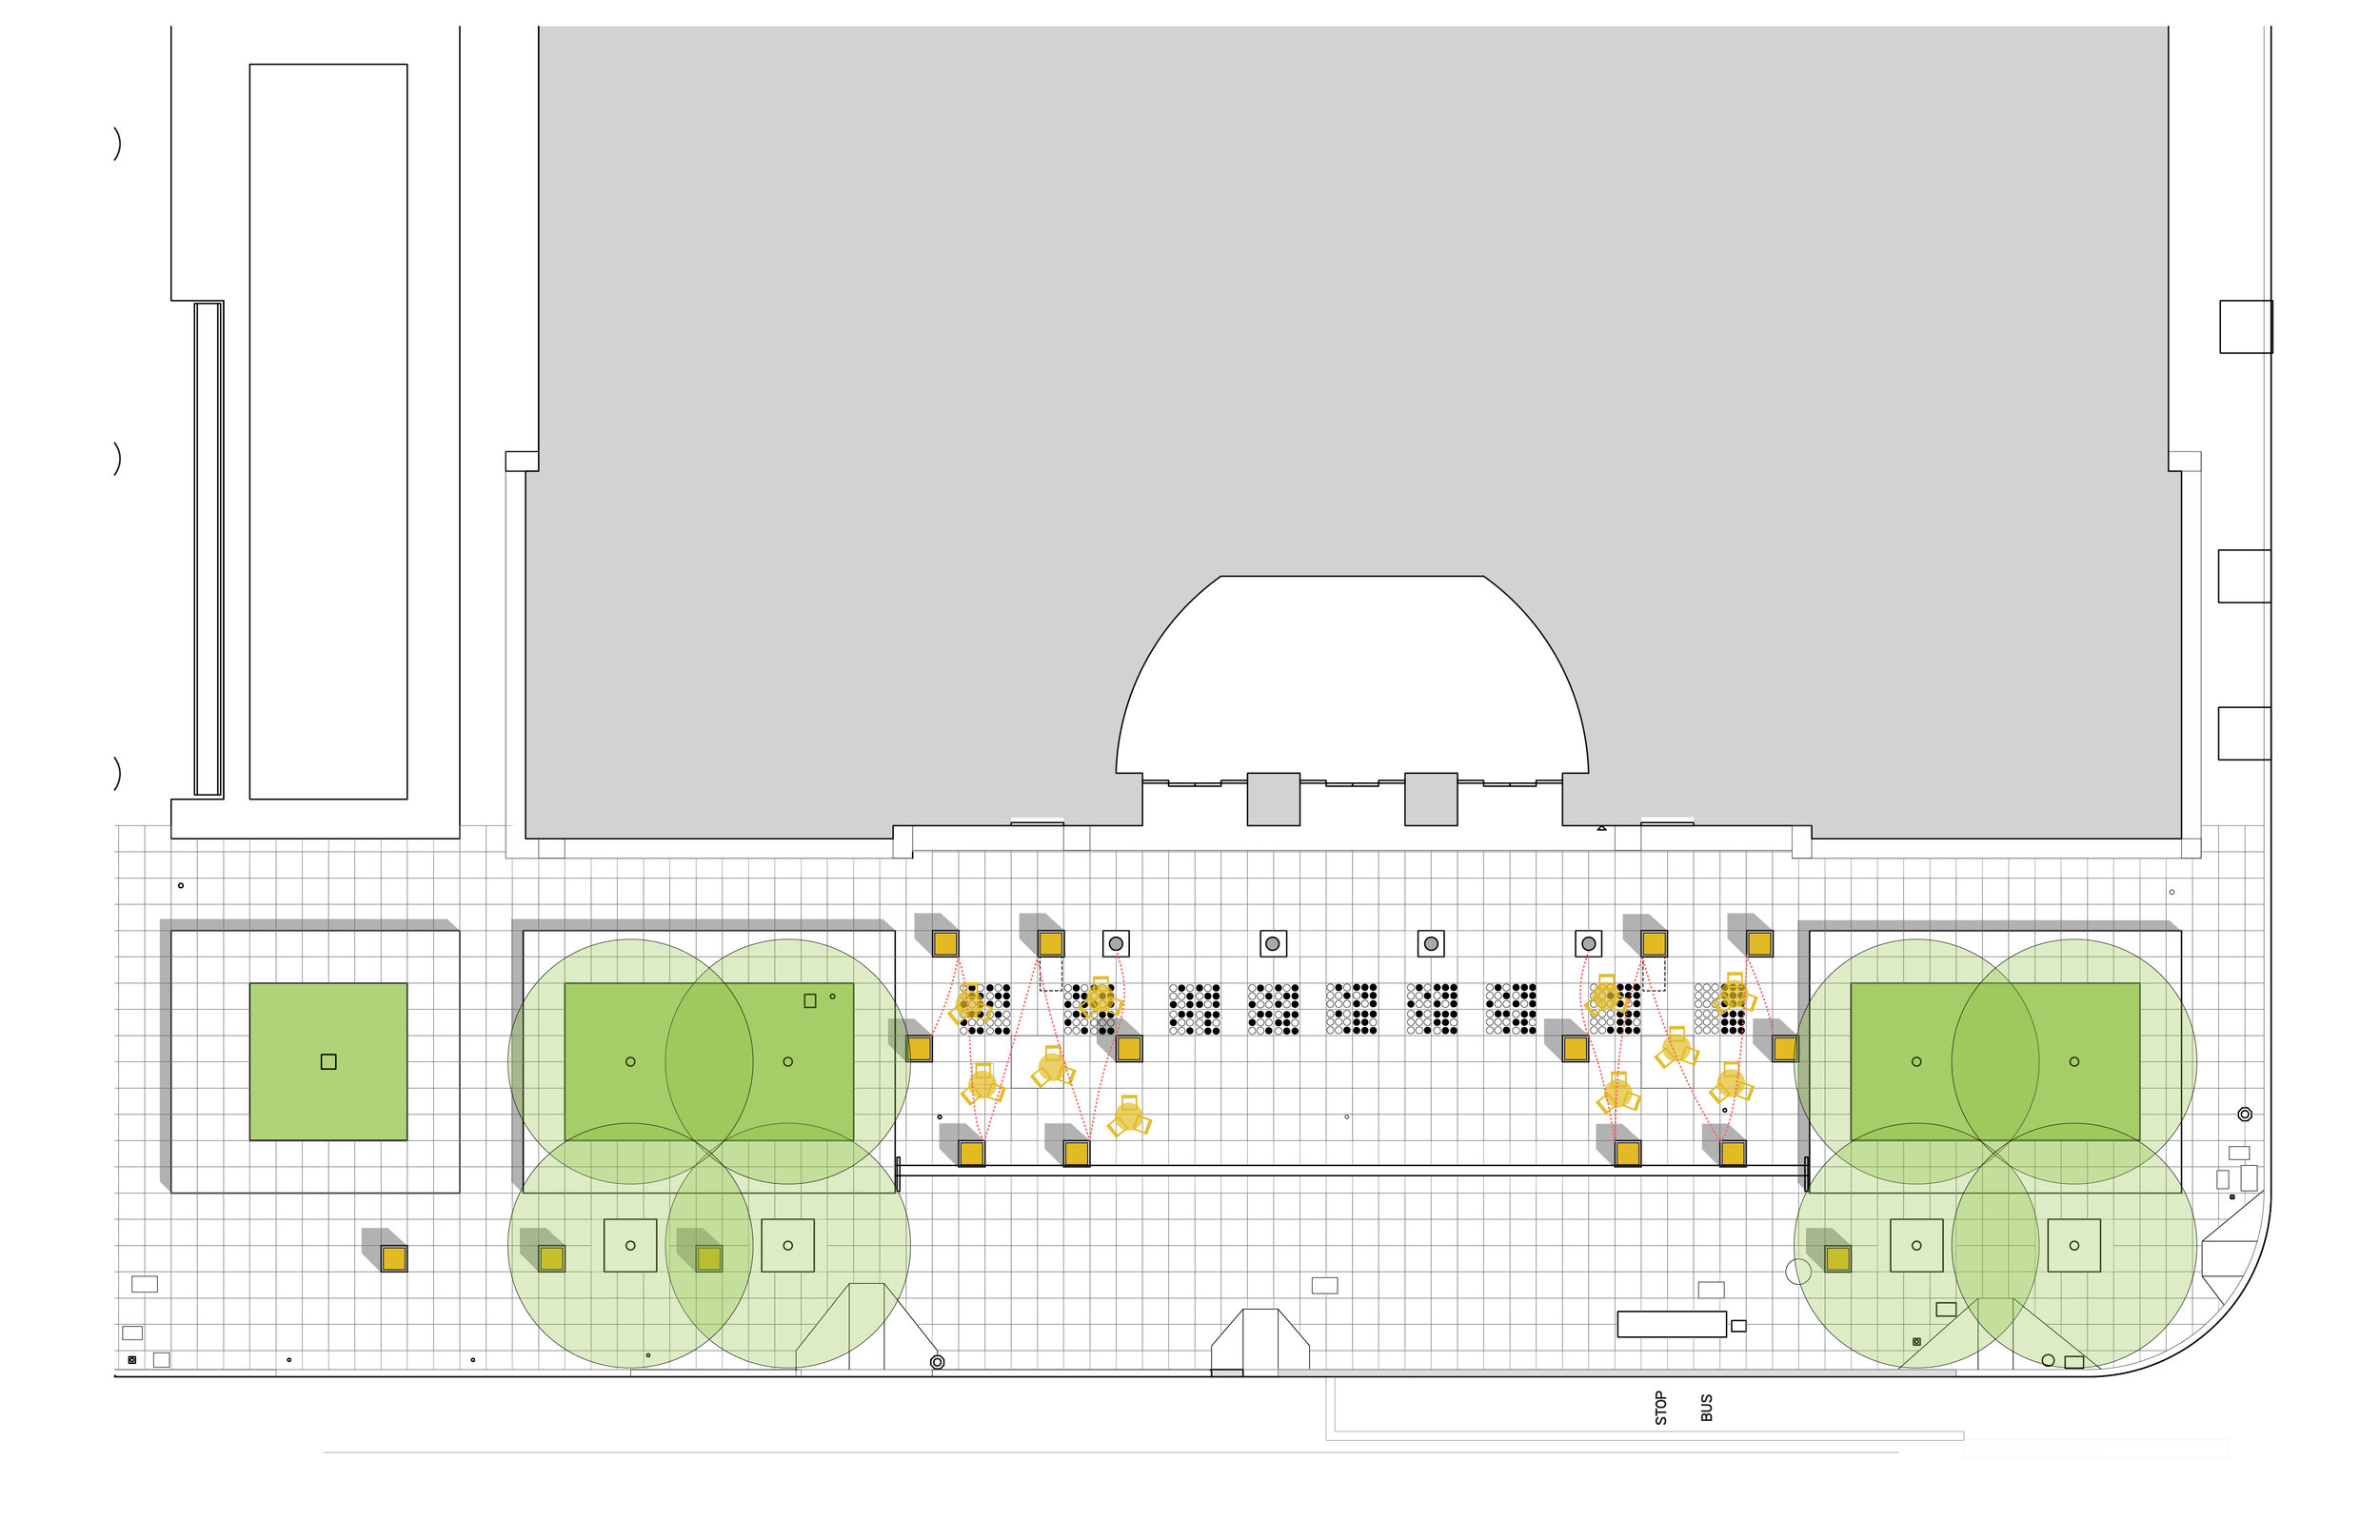 20190501 Base Site Plan-01.jpg